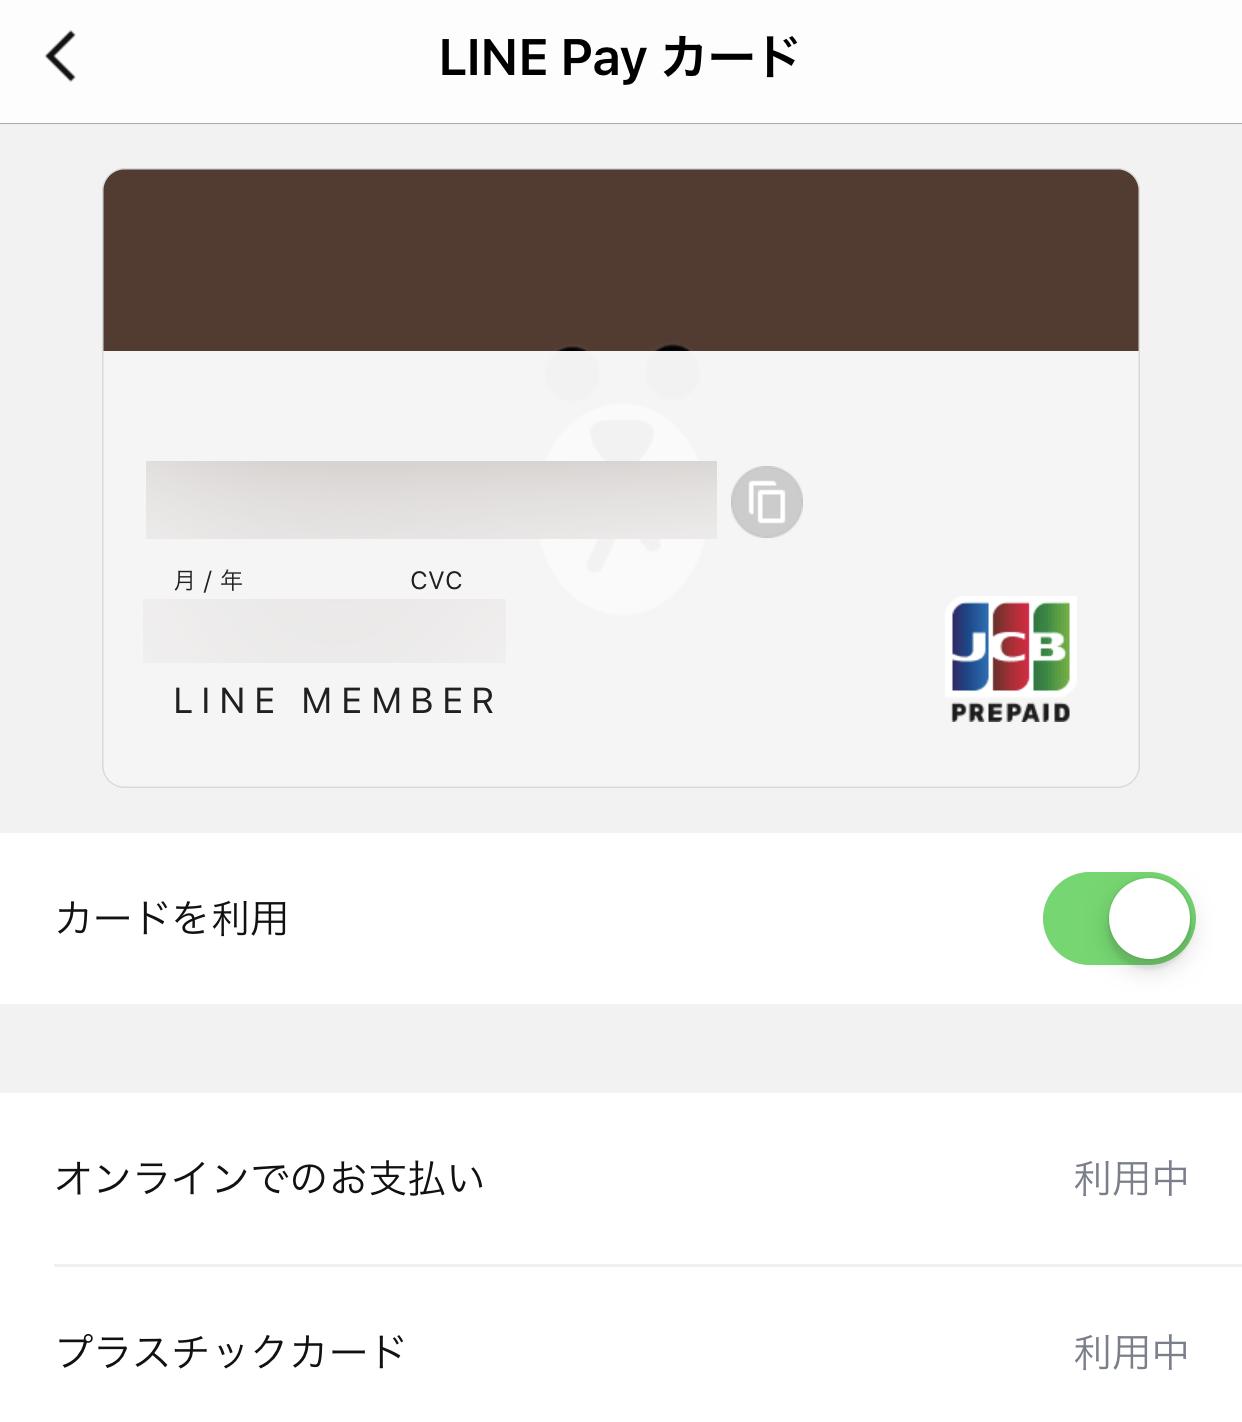 LINEPaycard teisi 01